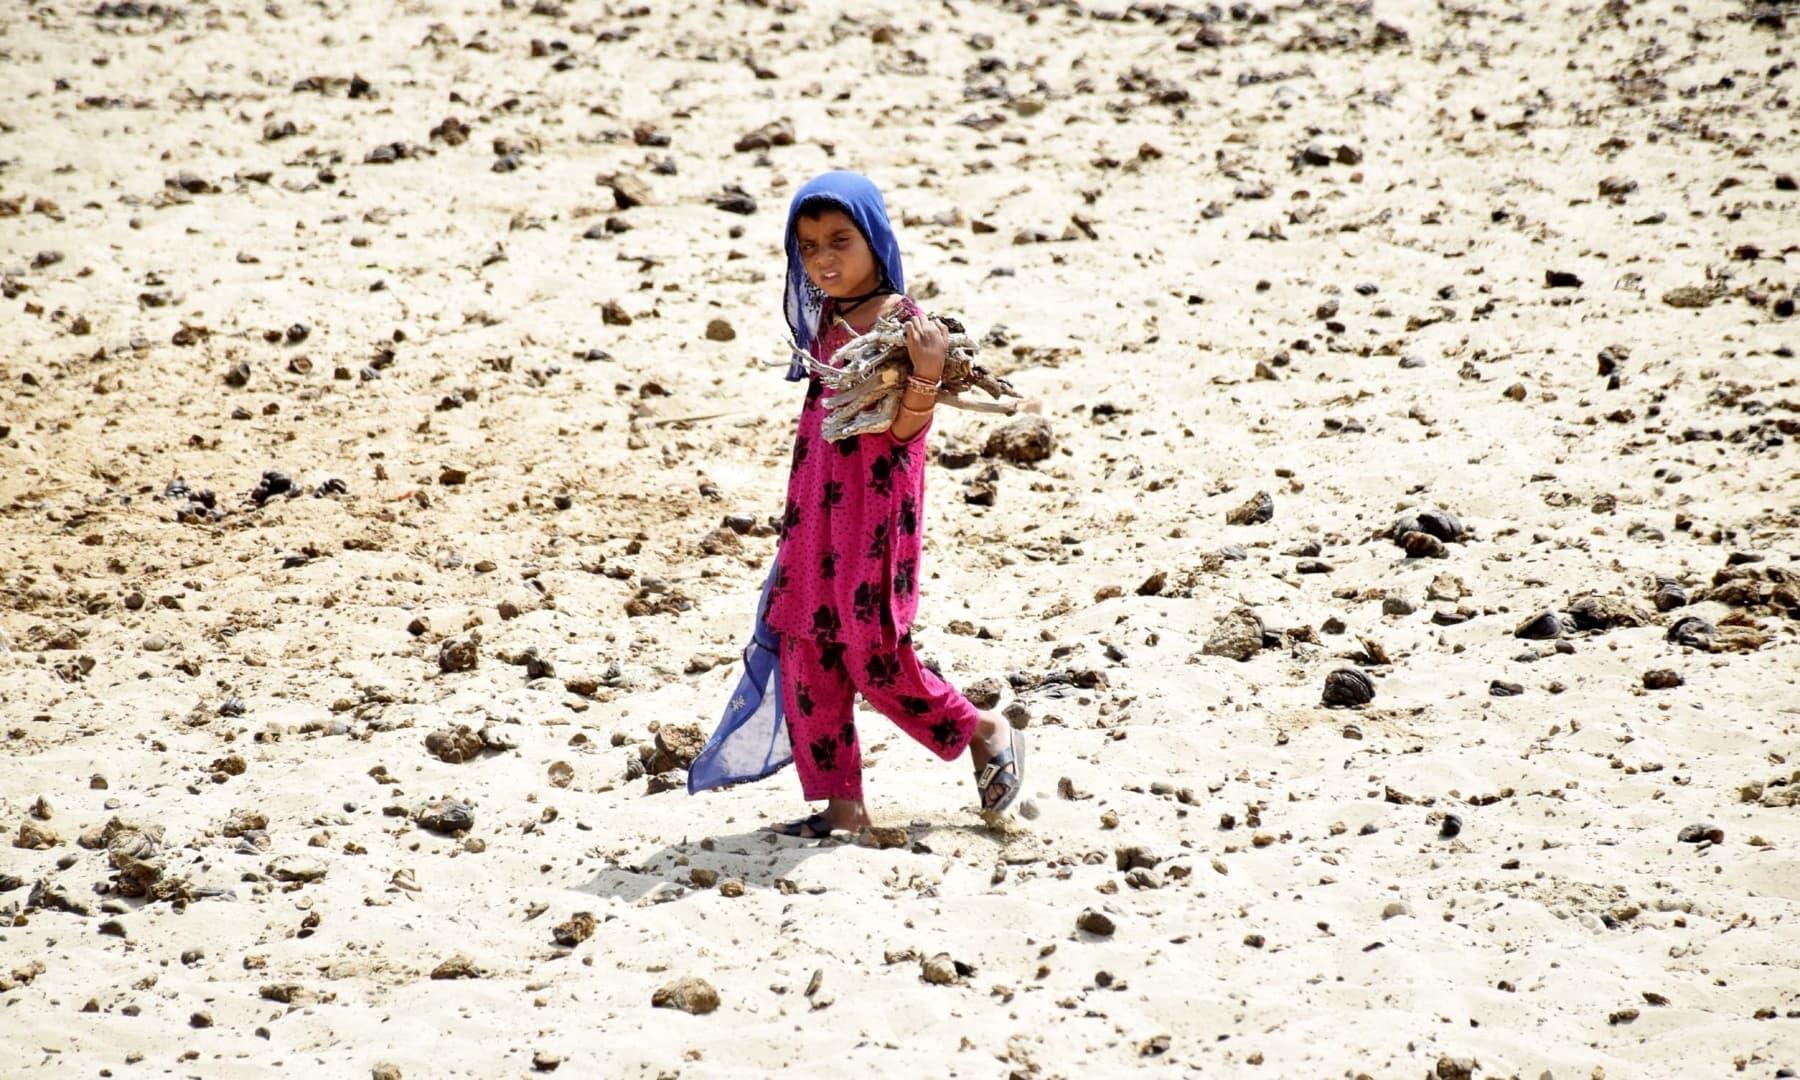 A child walks on barren and arid land in Achhro Thar, Khipro, Sindh. — Photo by Umair Ali